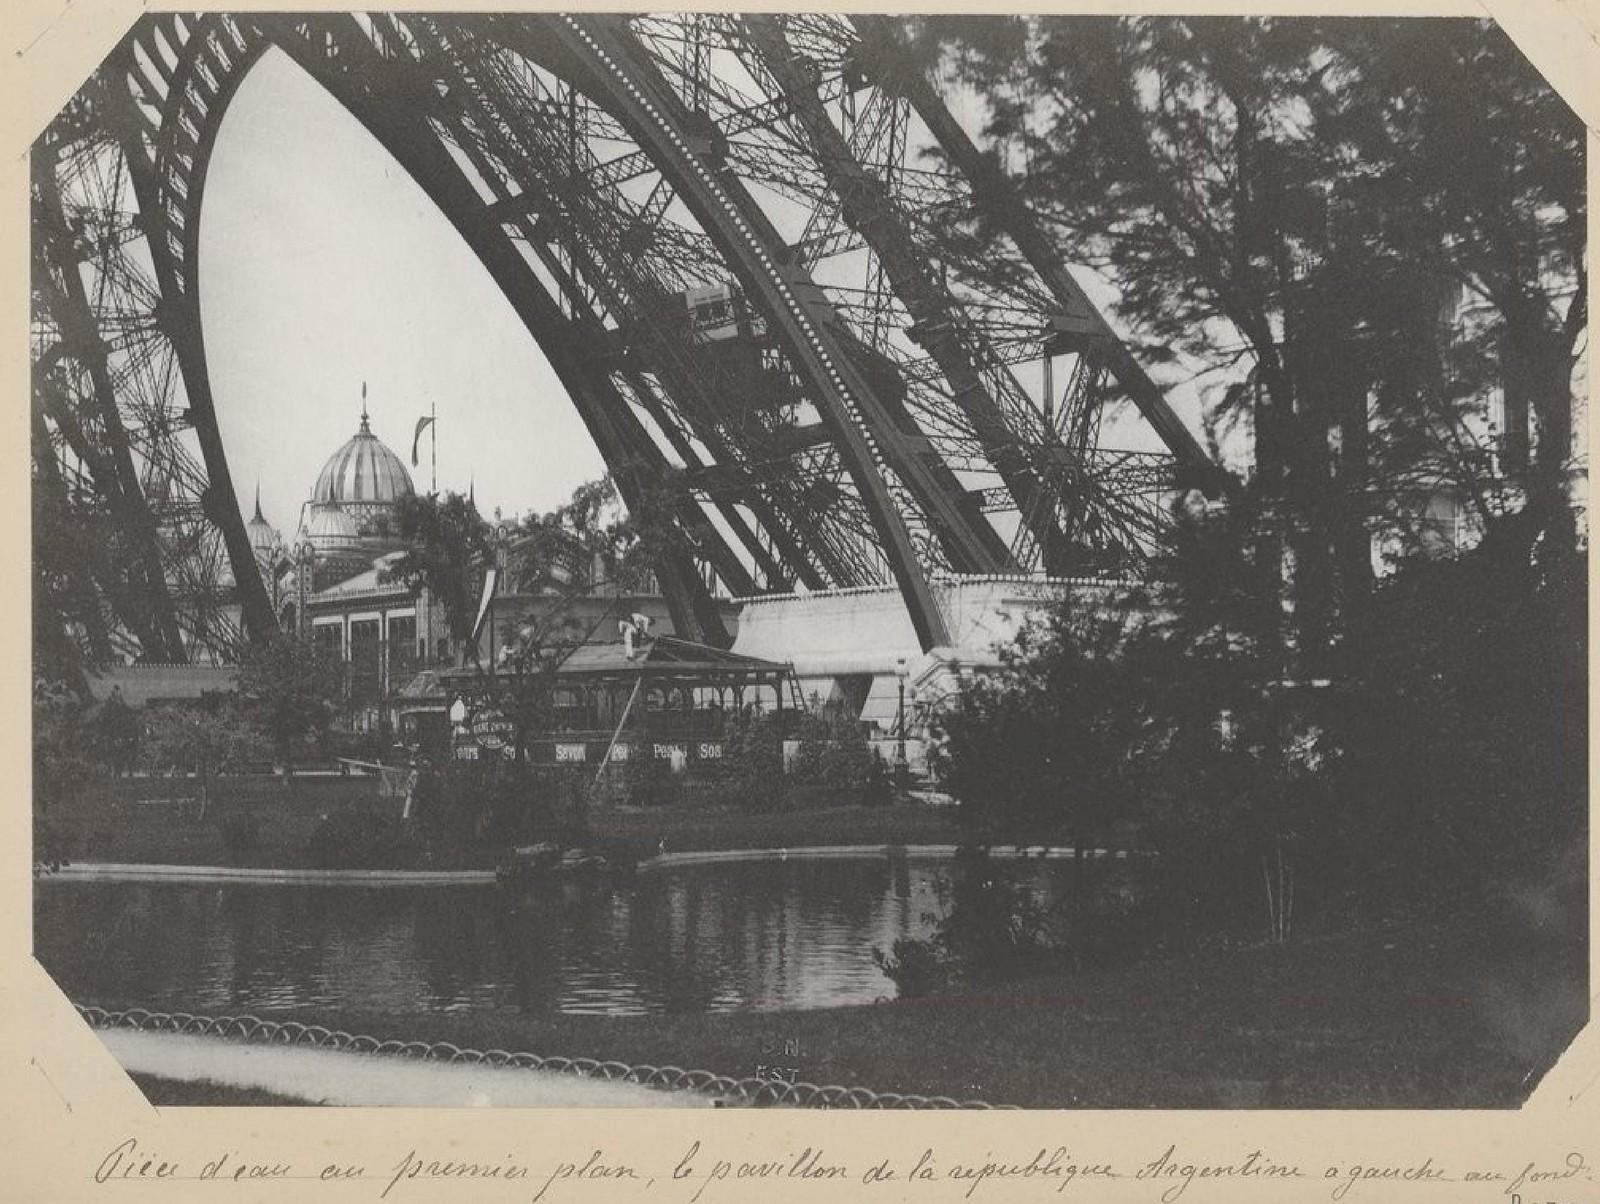 15. 1889. Фрагмент пруда на переднем плане, флаг Аргентинской Республики слева на заднем плане